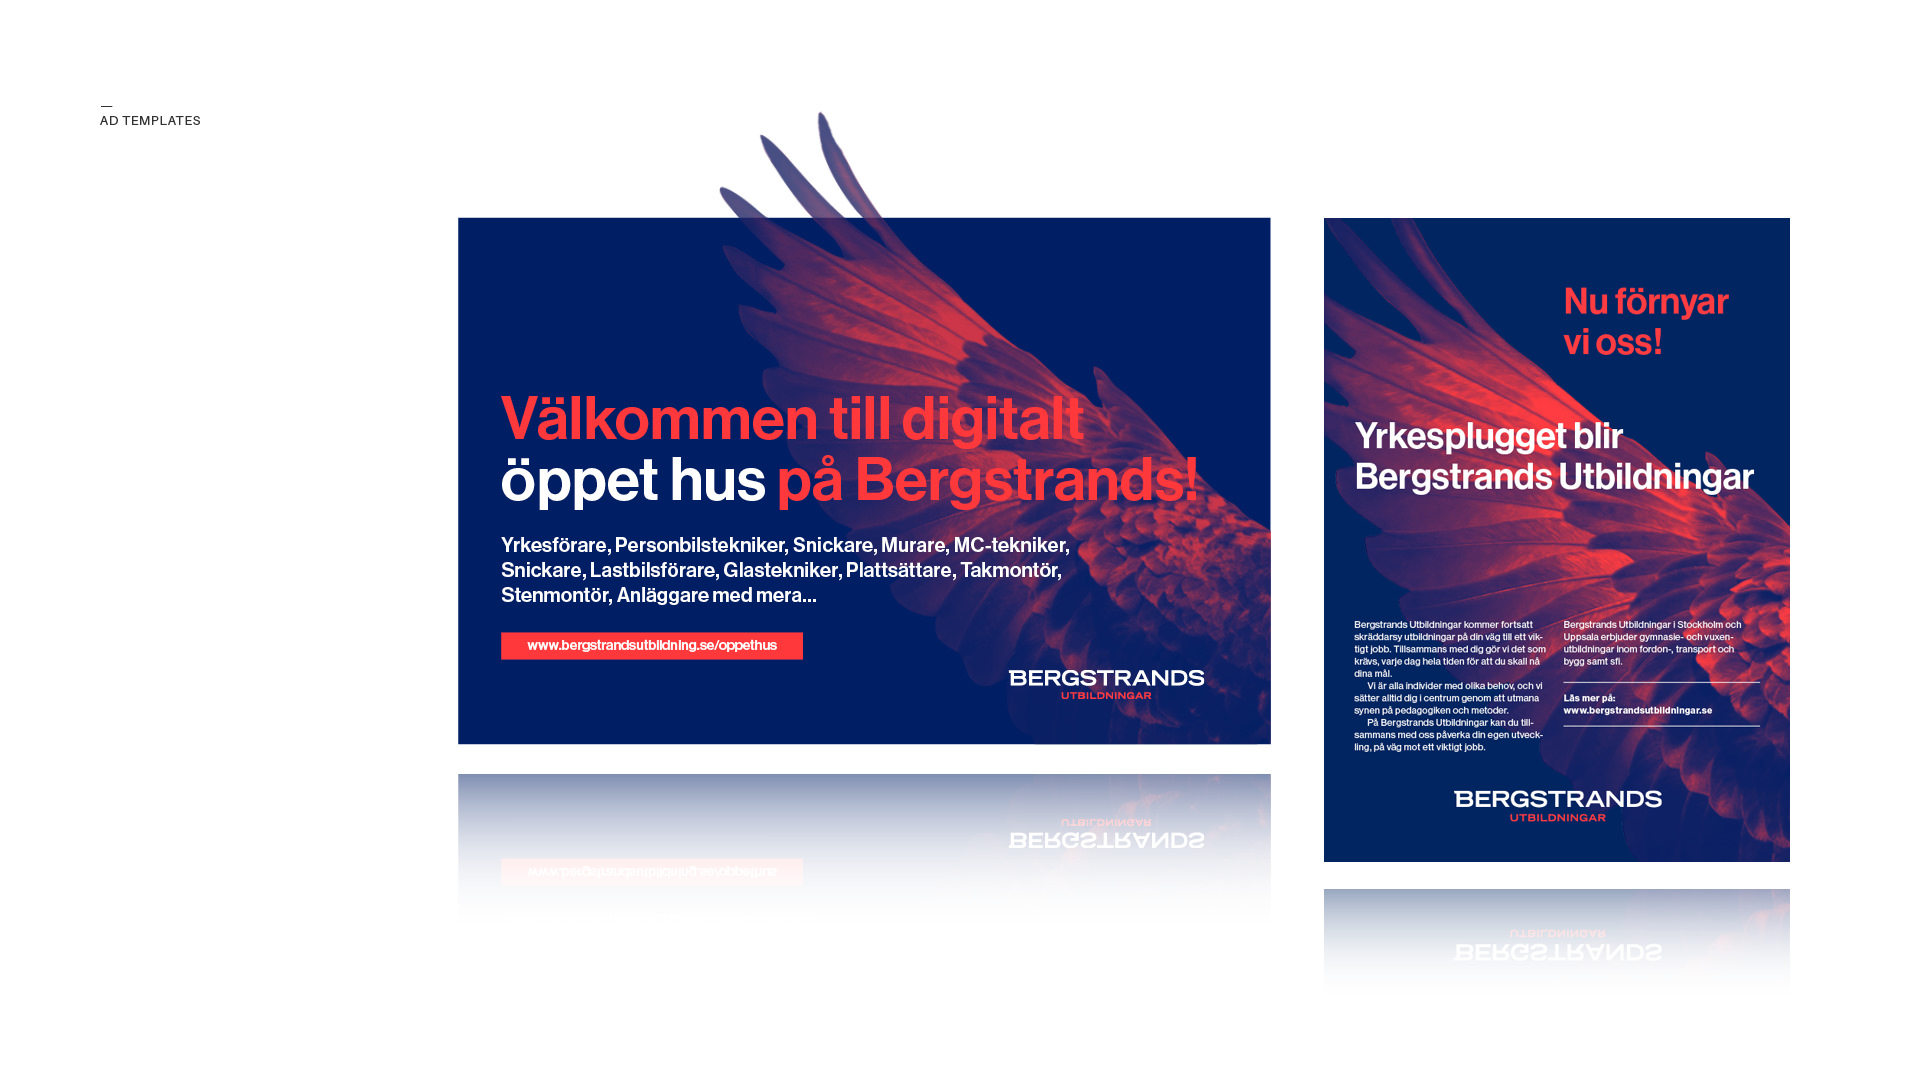 ad-template-design-bergstrand-2